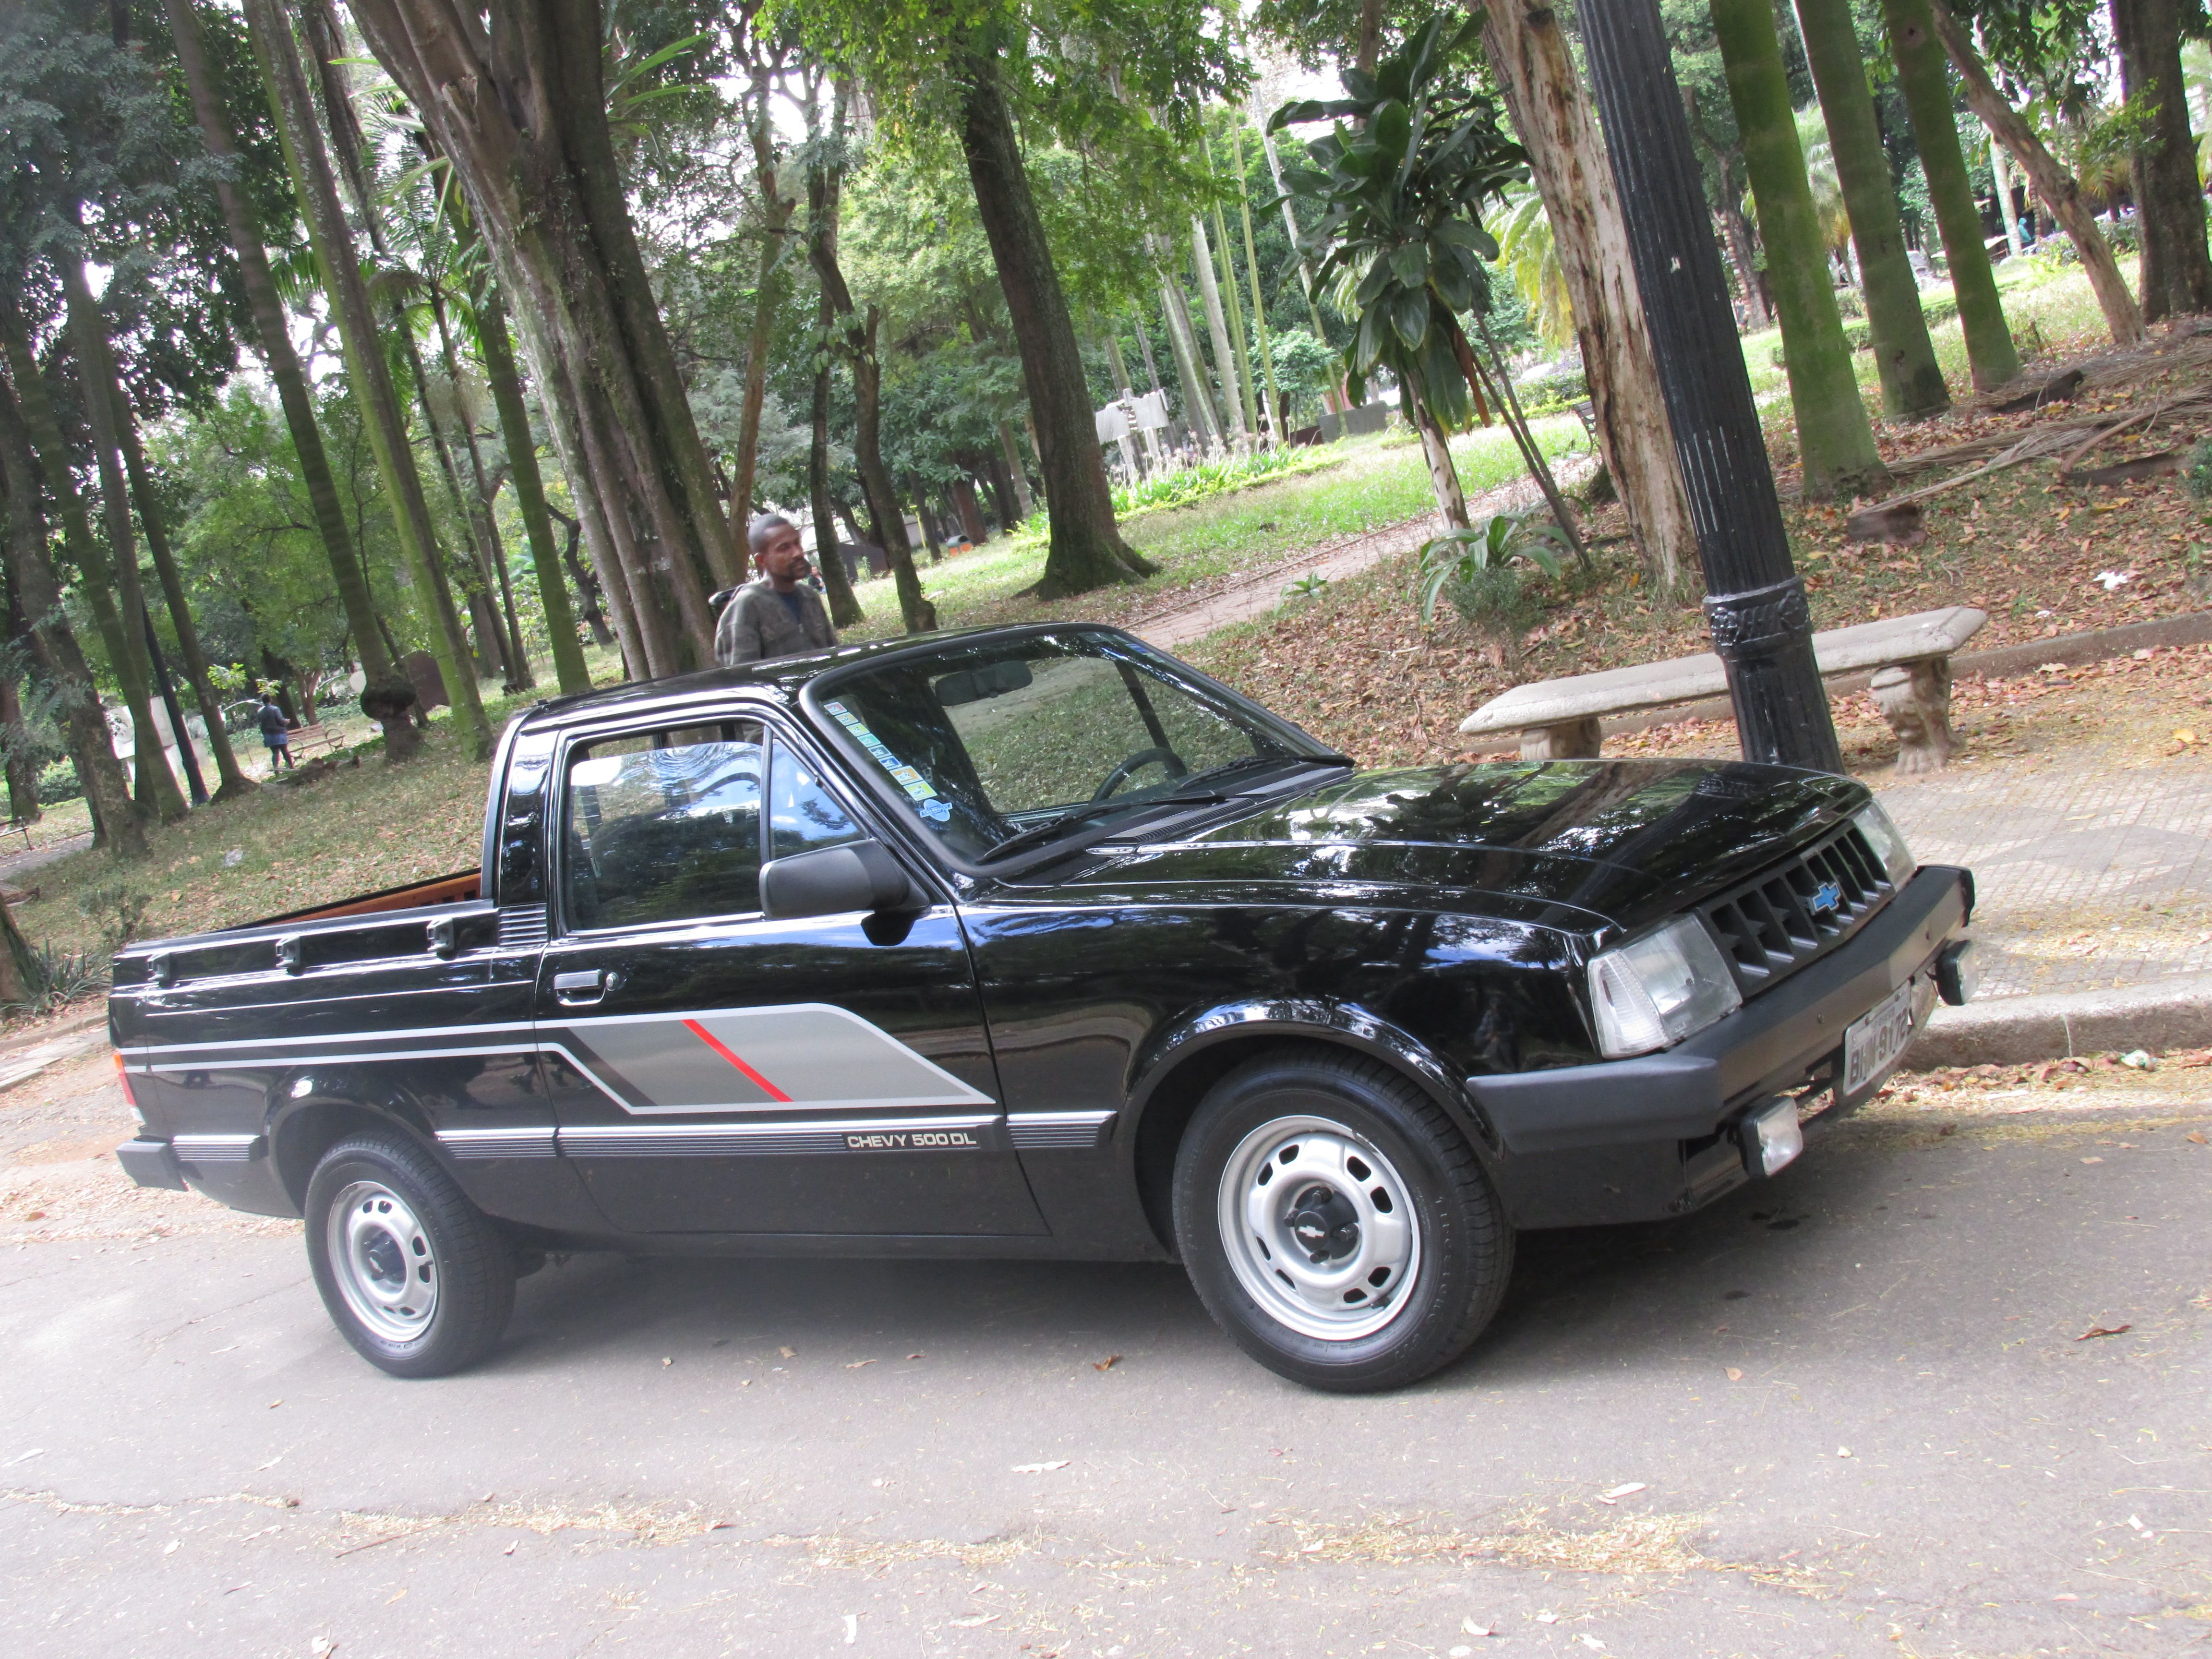 Chevrolet Chevy 500 Chevette Carros Camionete